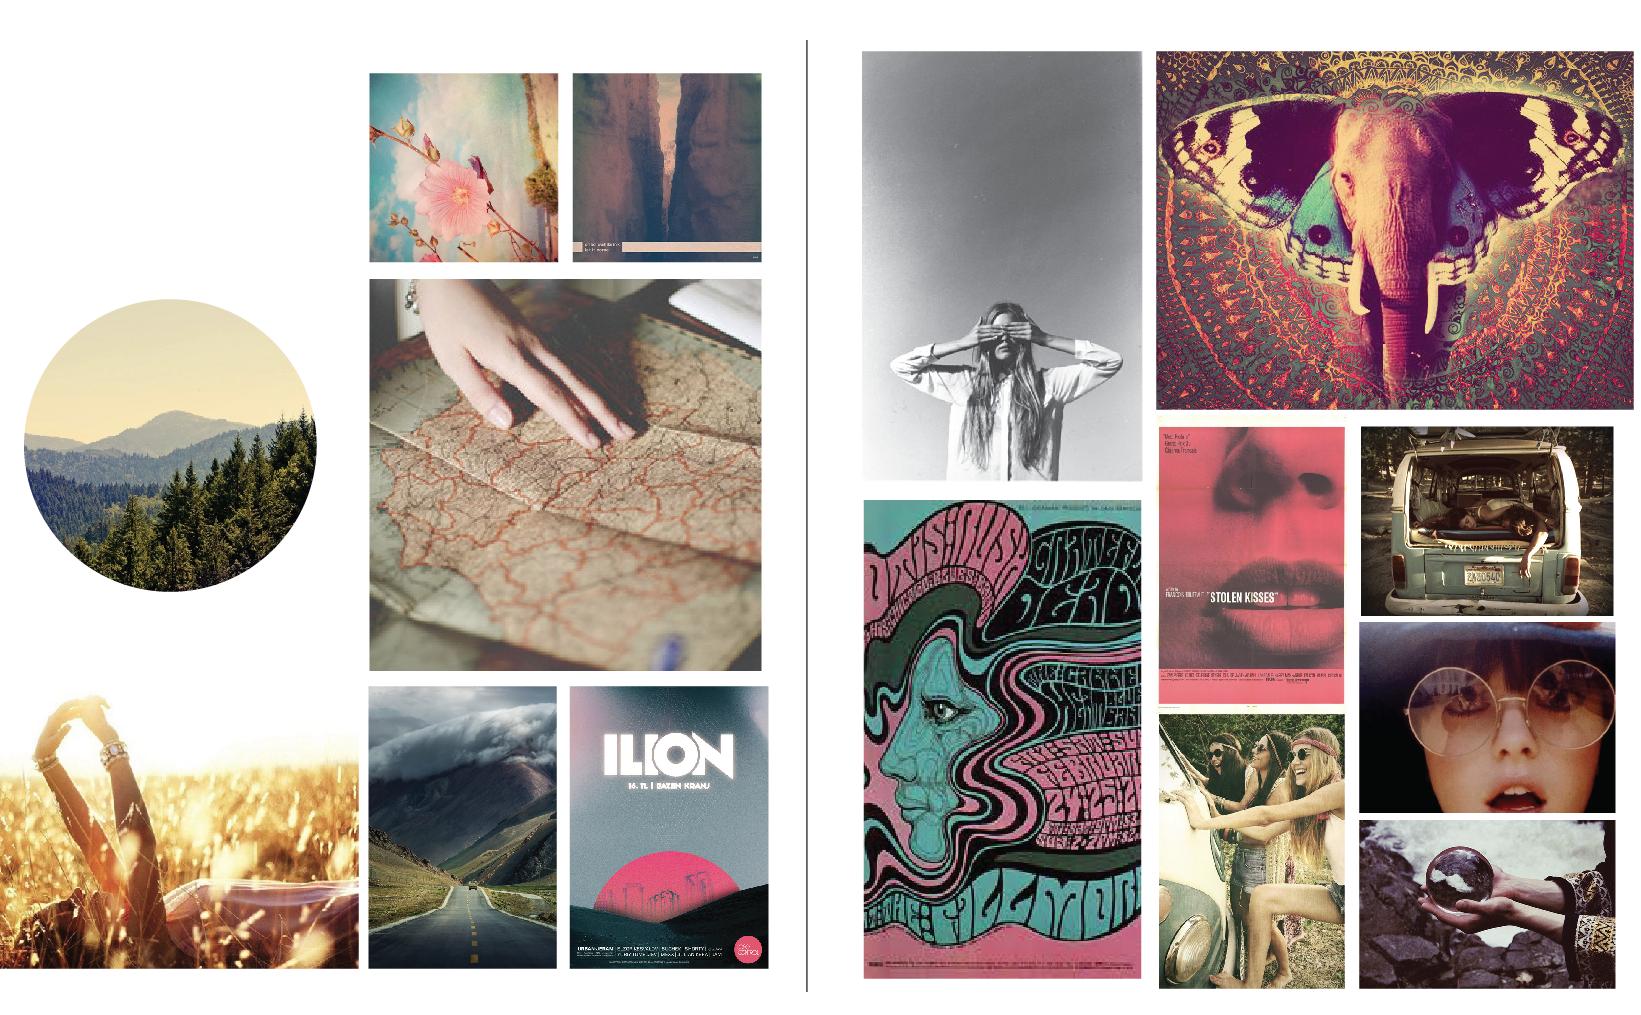 Fleetwood Mac - image 11 - student project